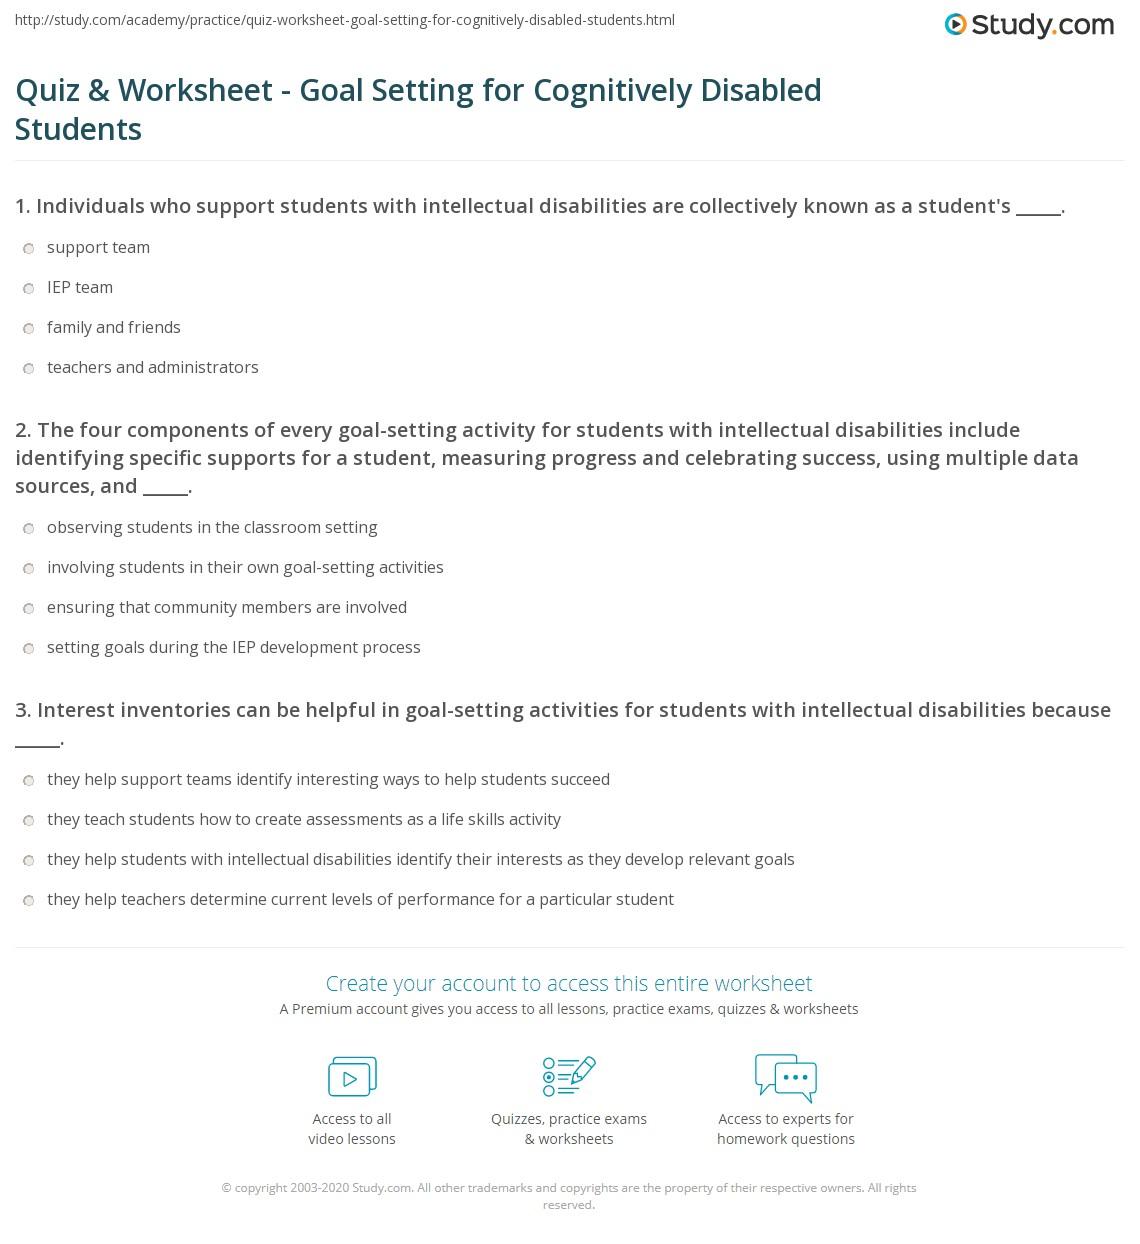 Quiz Worksheet Goal Setting For Cognitively Disabled Students